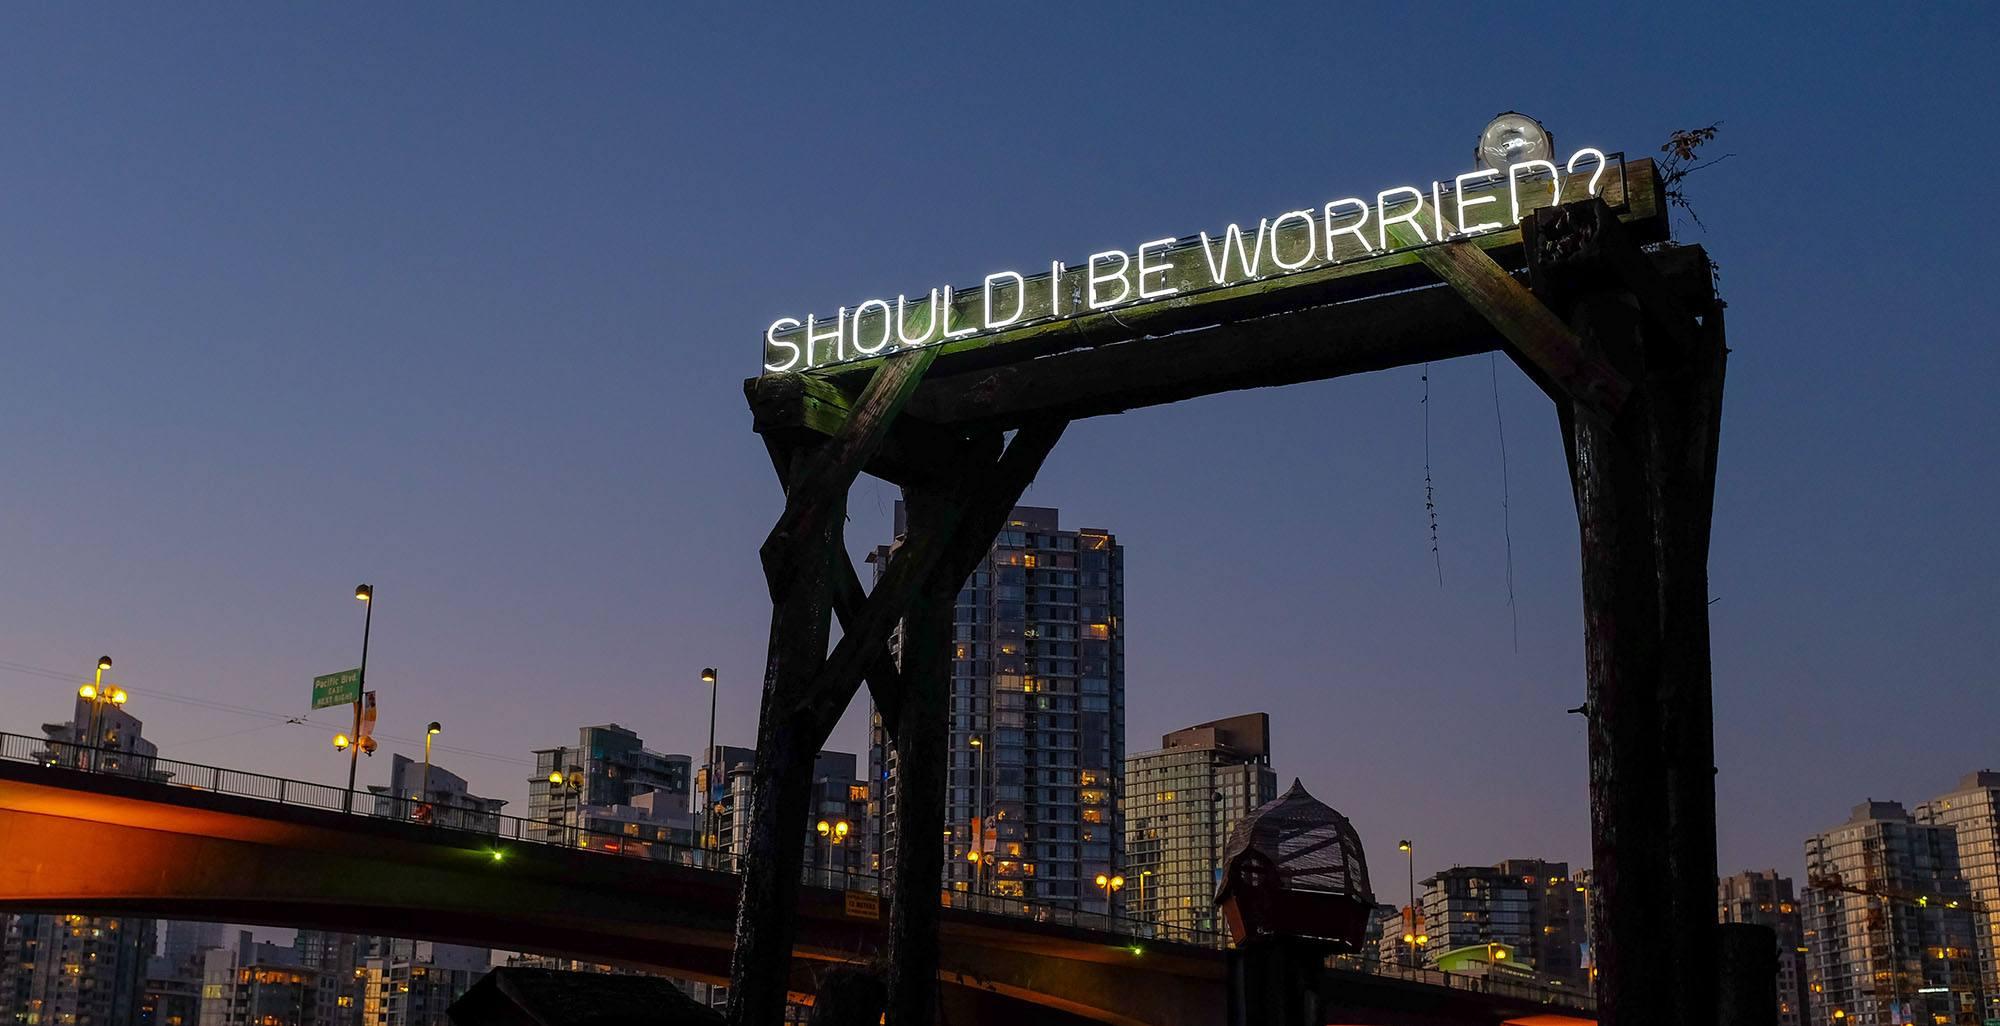 New neon public artwork unveiled in Vancouver's False Creek